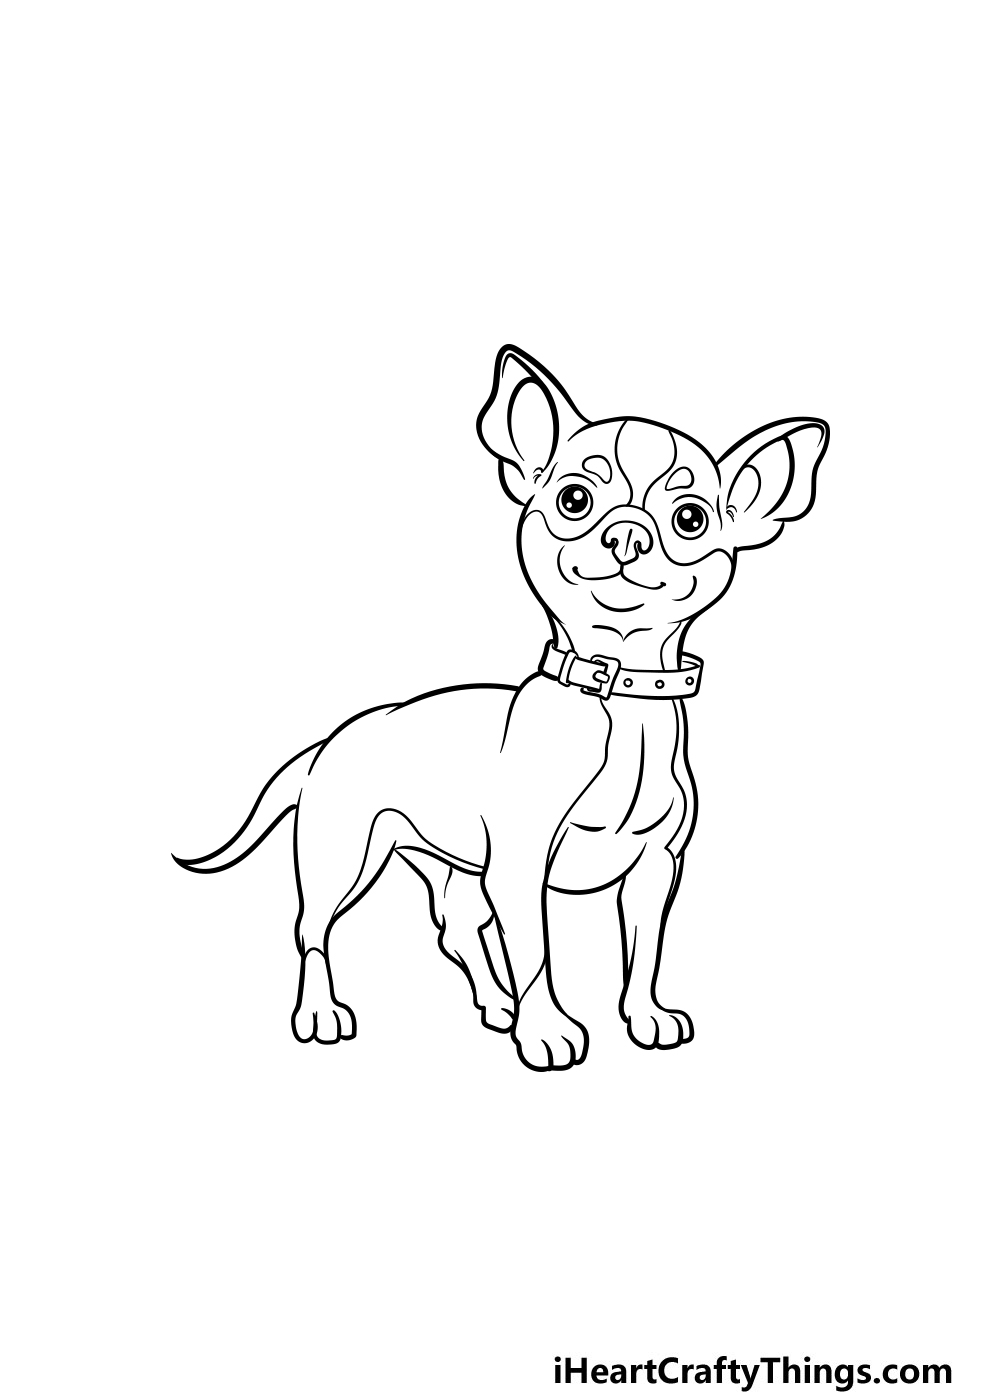 drawing a chihuahua step 7